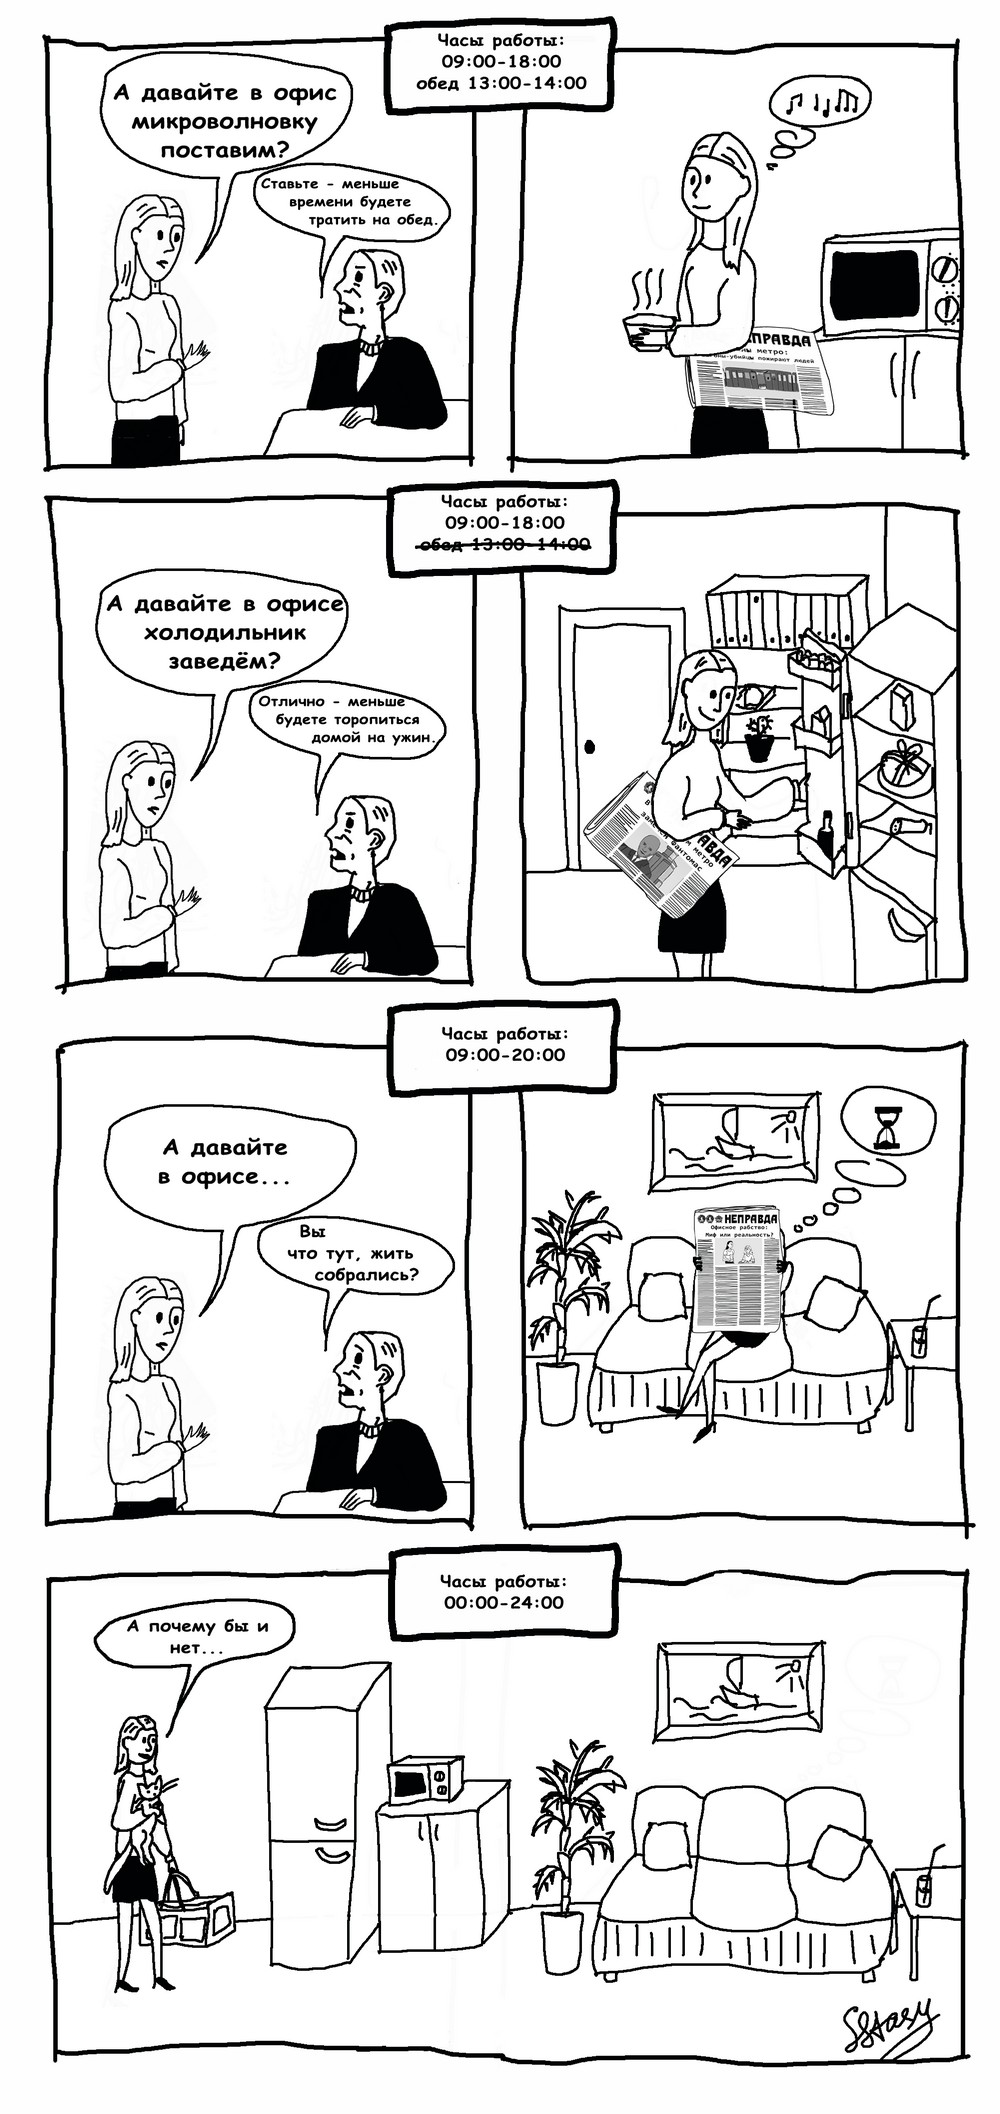 Комикс битва №16 выпуск 137